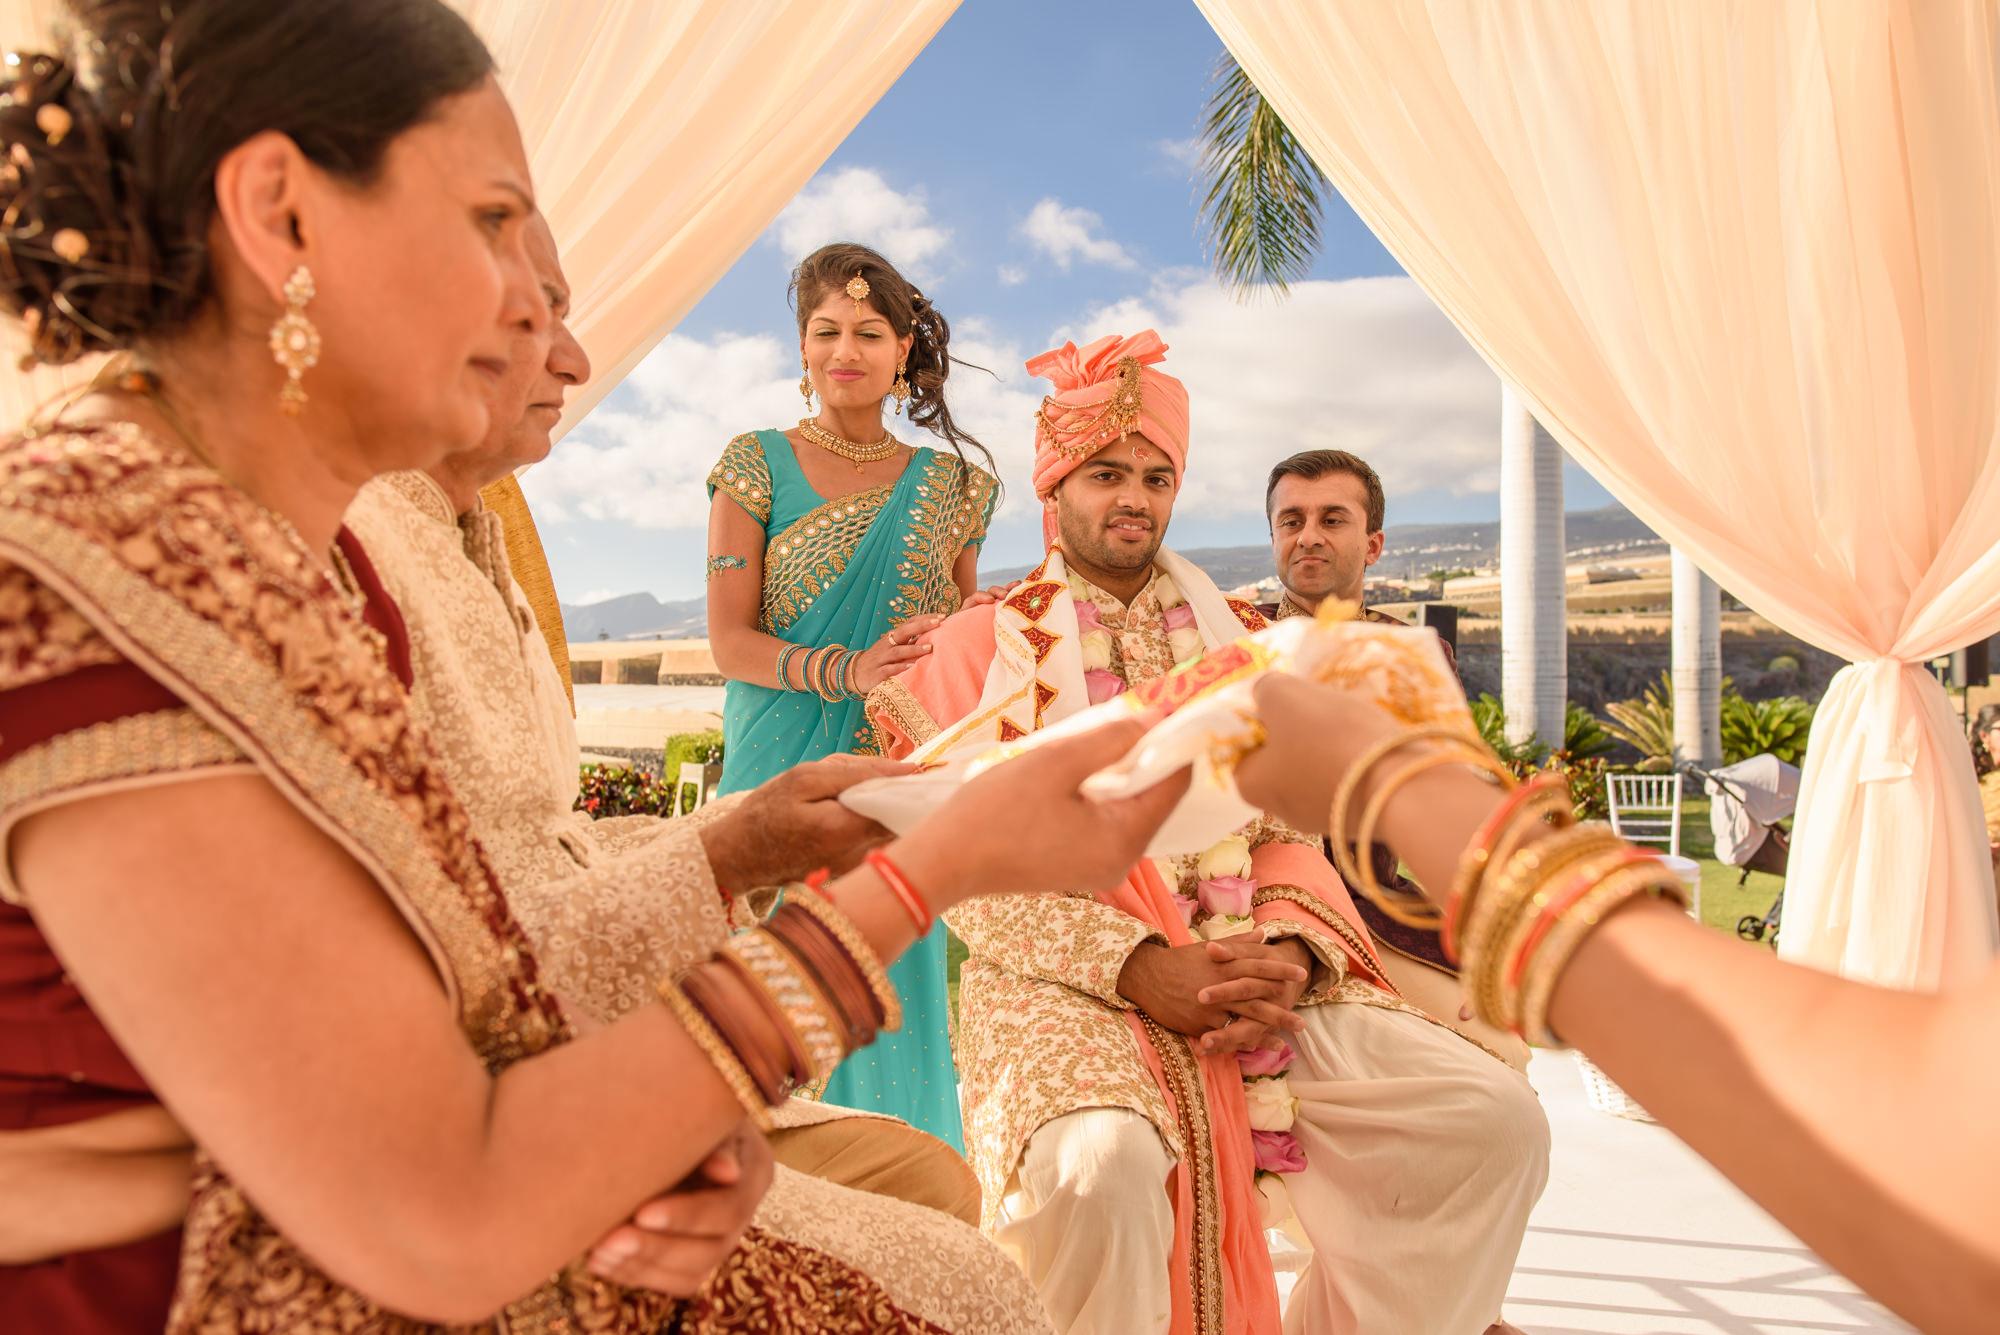 satnam photography wedding indian asian hindu destination wedding photographer tenerife ritz carlton abama-155.jpg